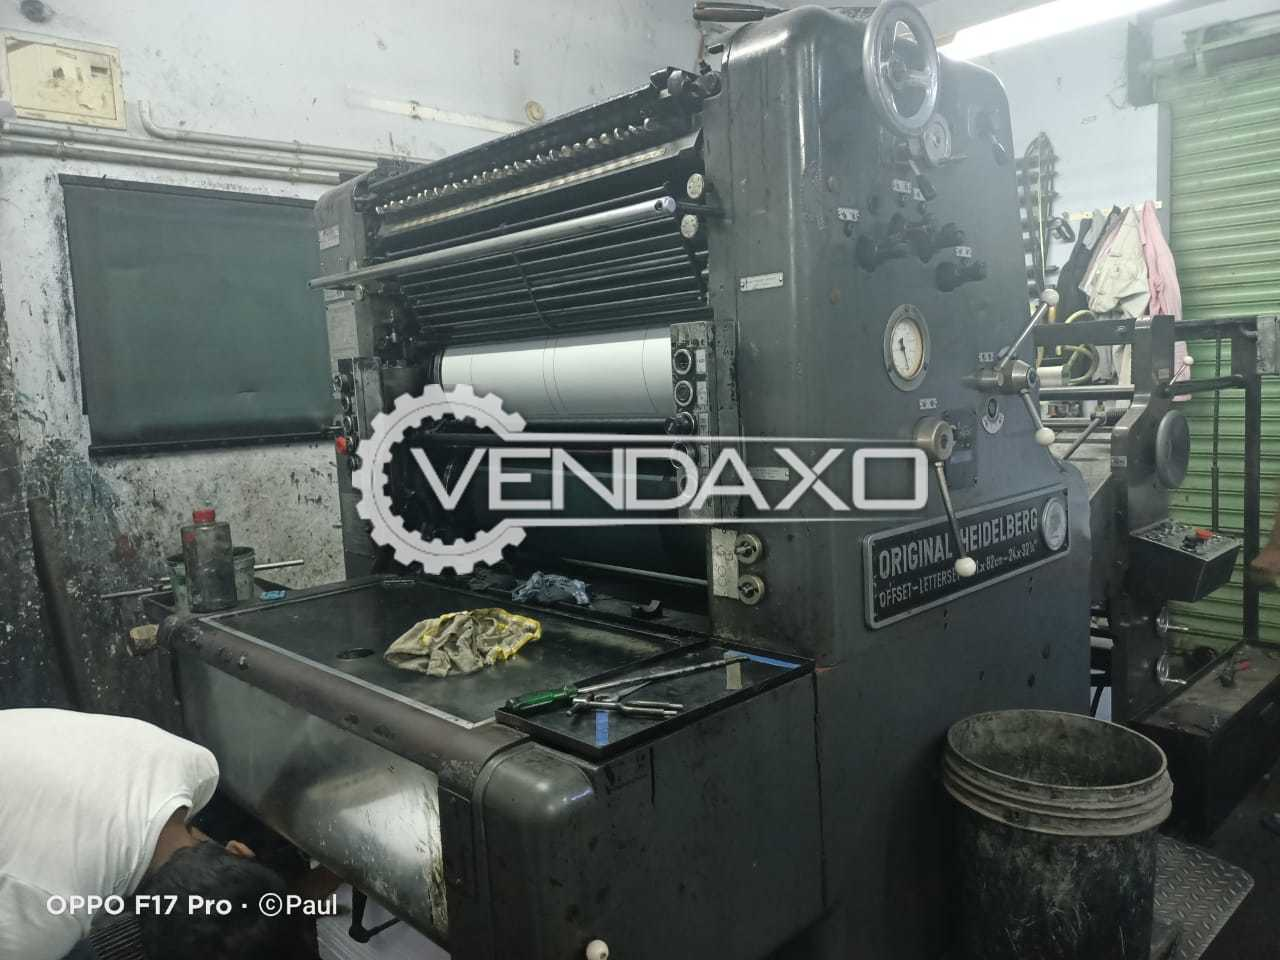 Heidelberg SOR Offset Printing Machine - 24 X 32 Inch, Single Color